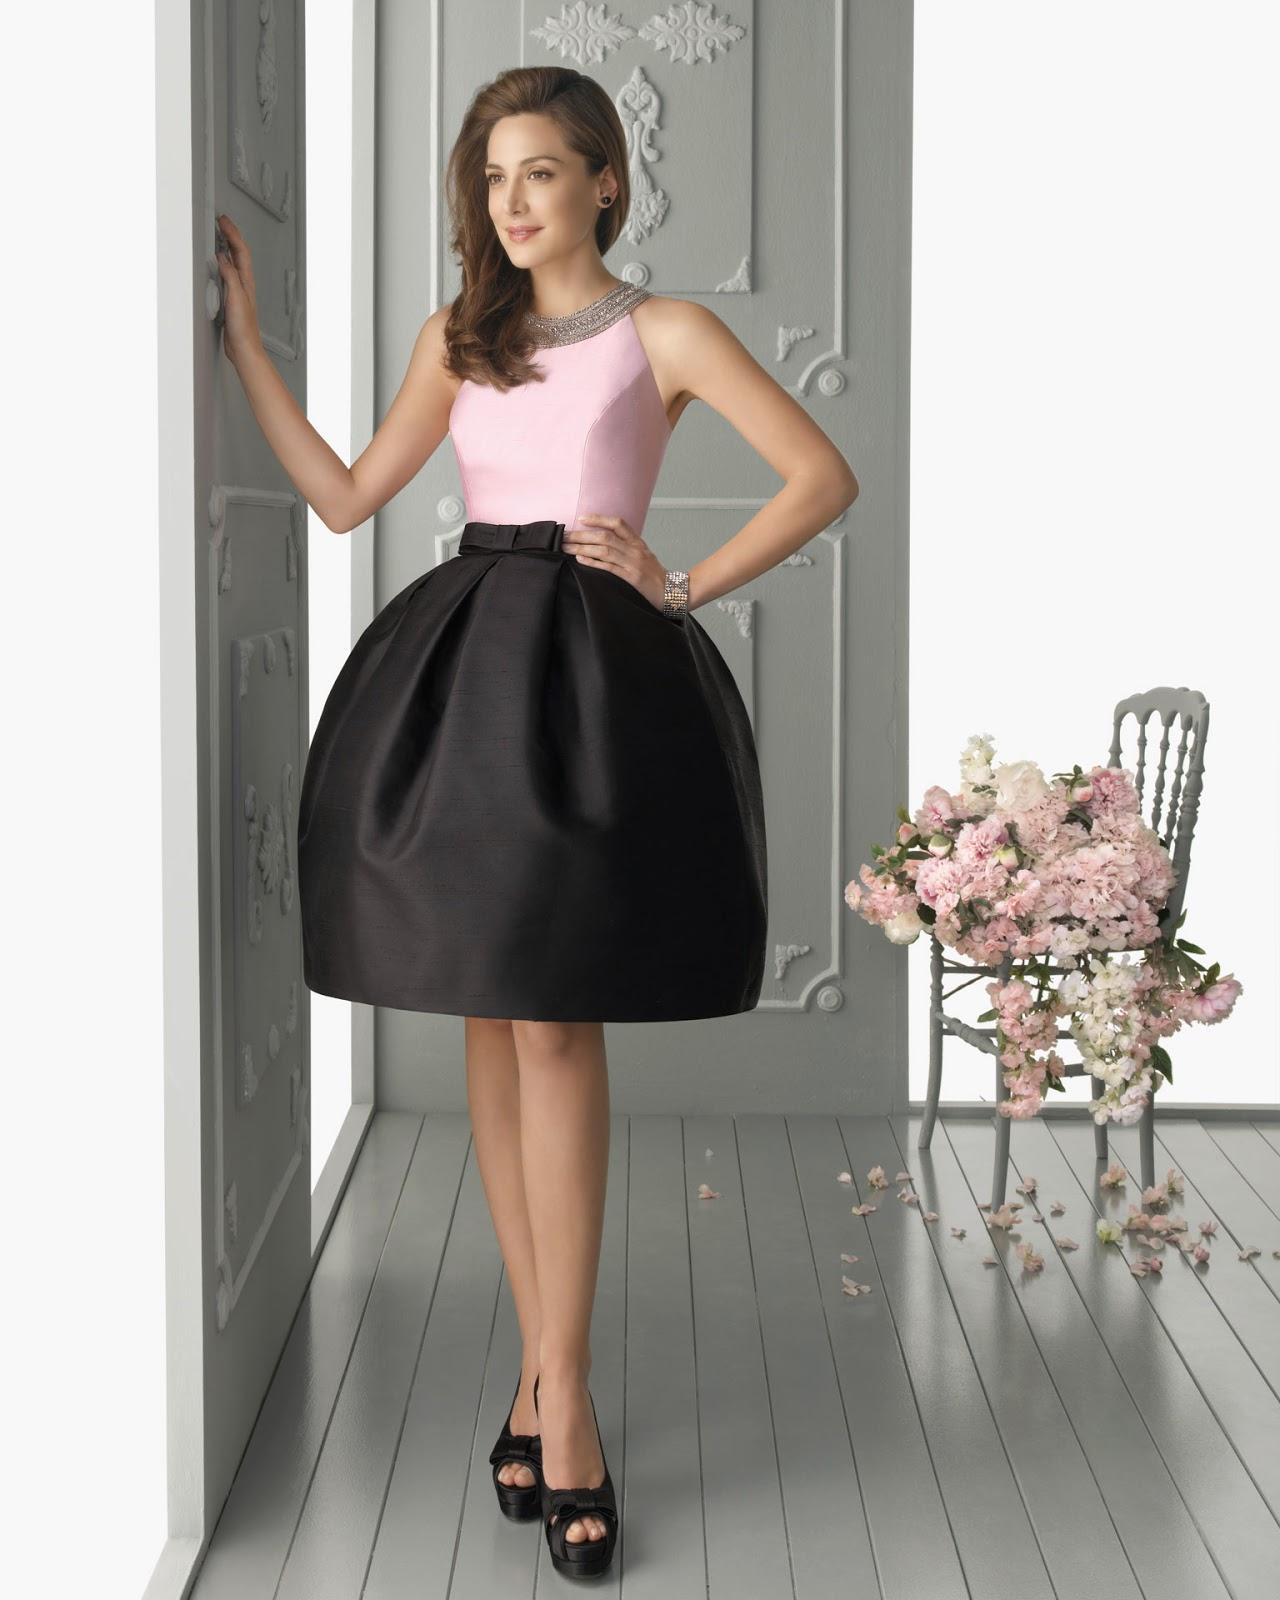 http://www.rosanovias.com.au/nectarean-halter-beading-satin-ball-gown-kneelength-bows-prom-dresses-p-2393.html#.VG5Ql8mxj79